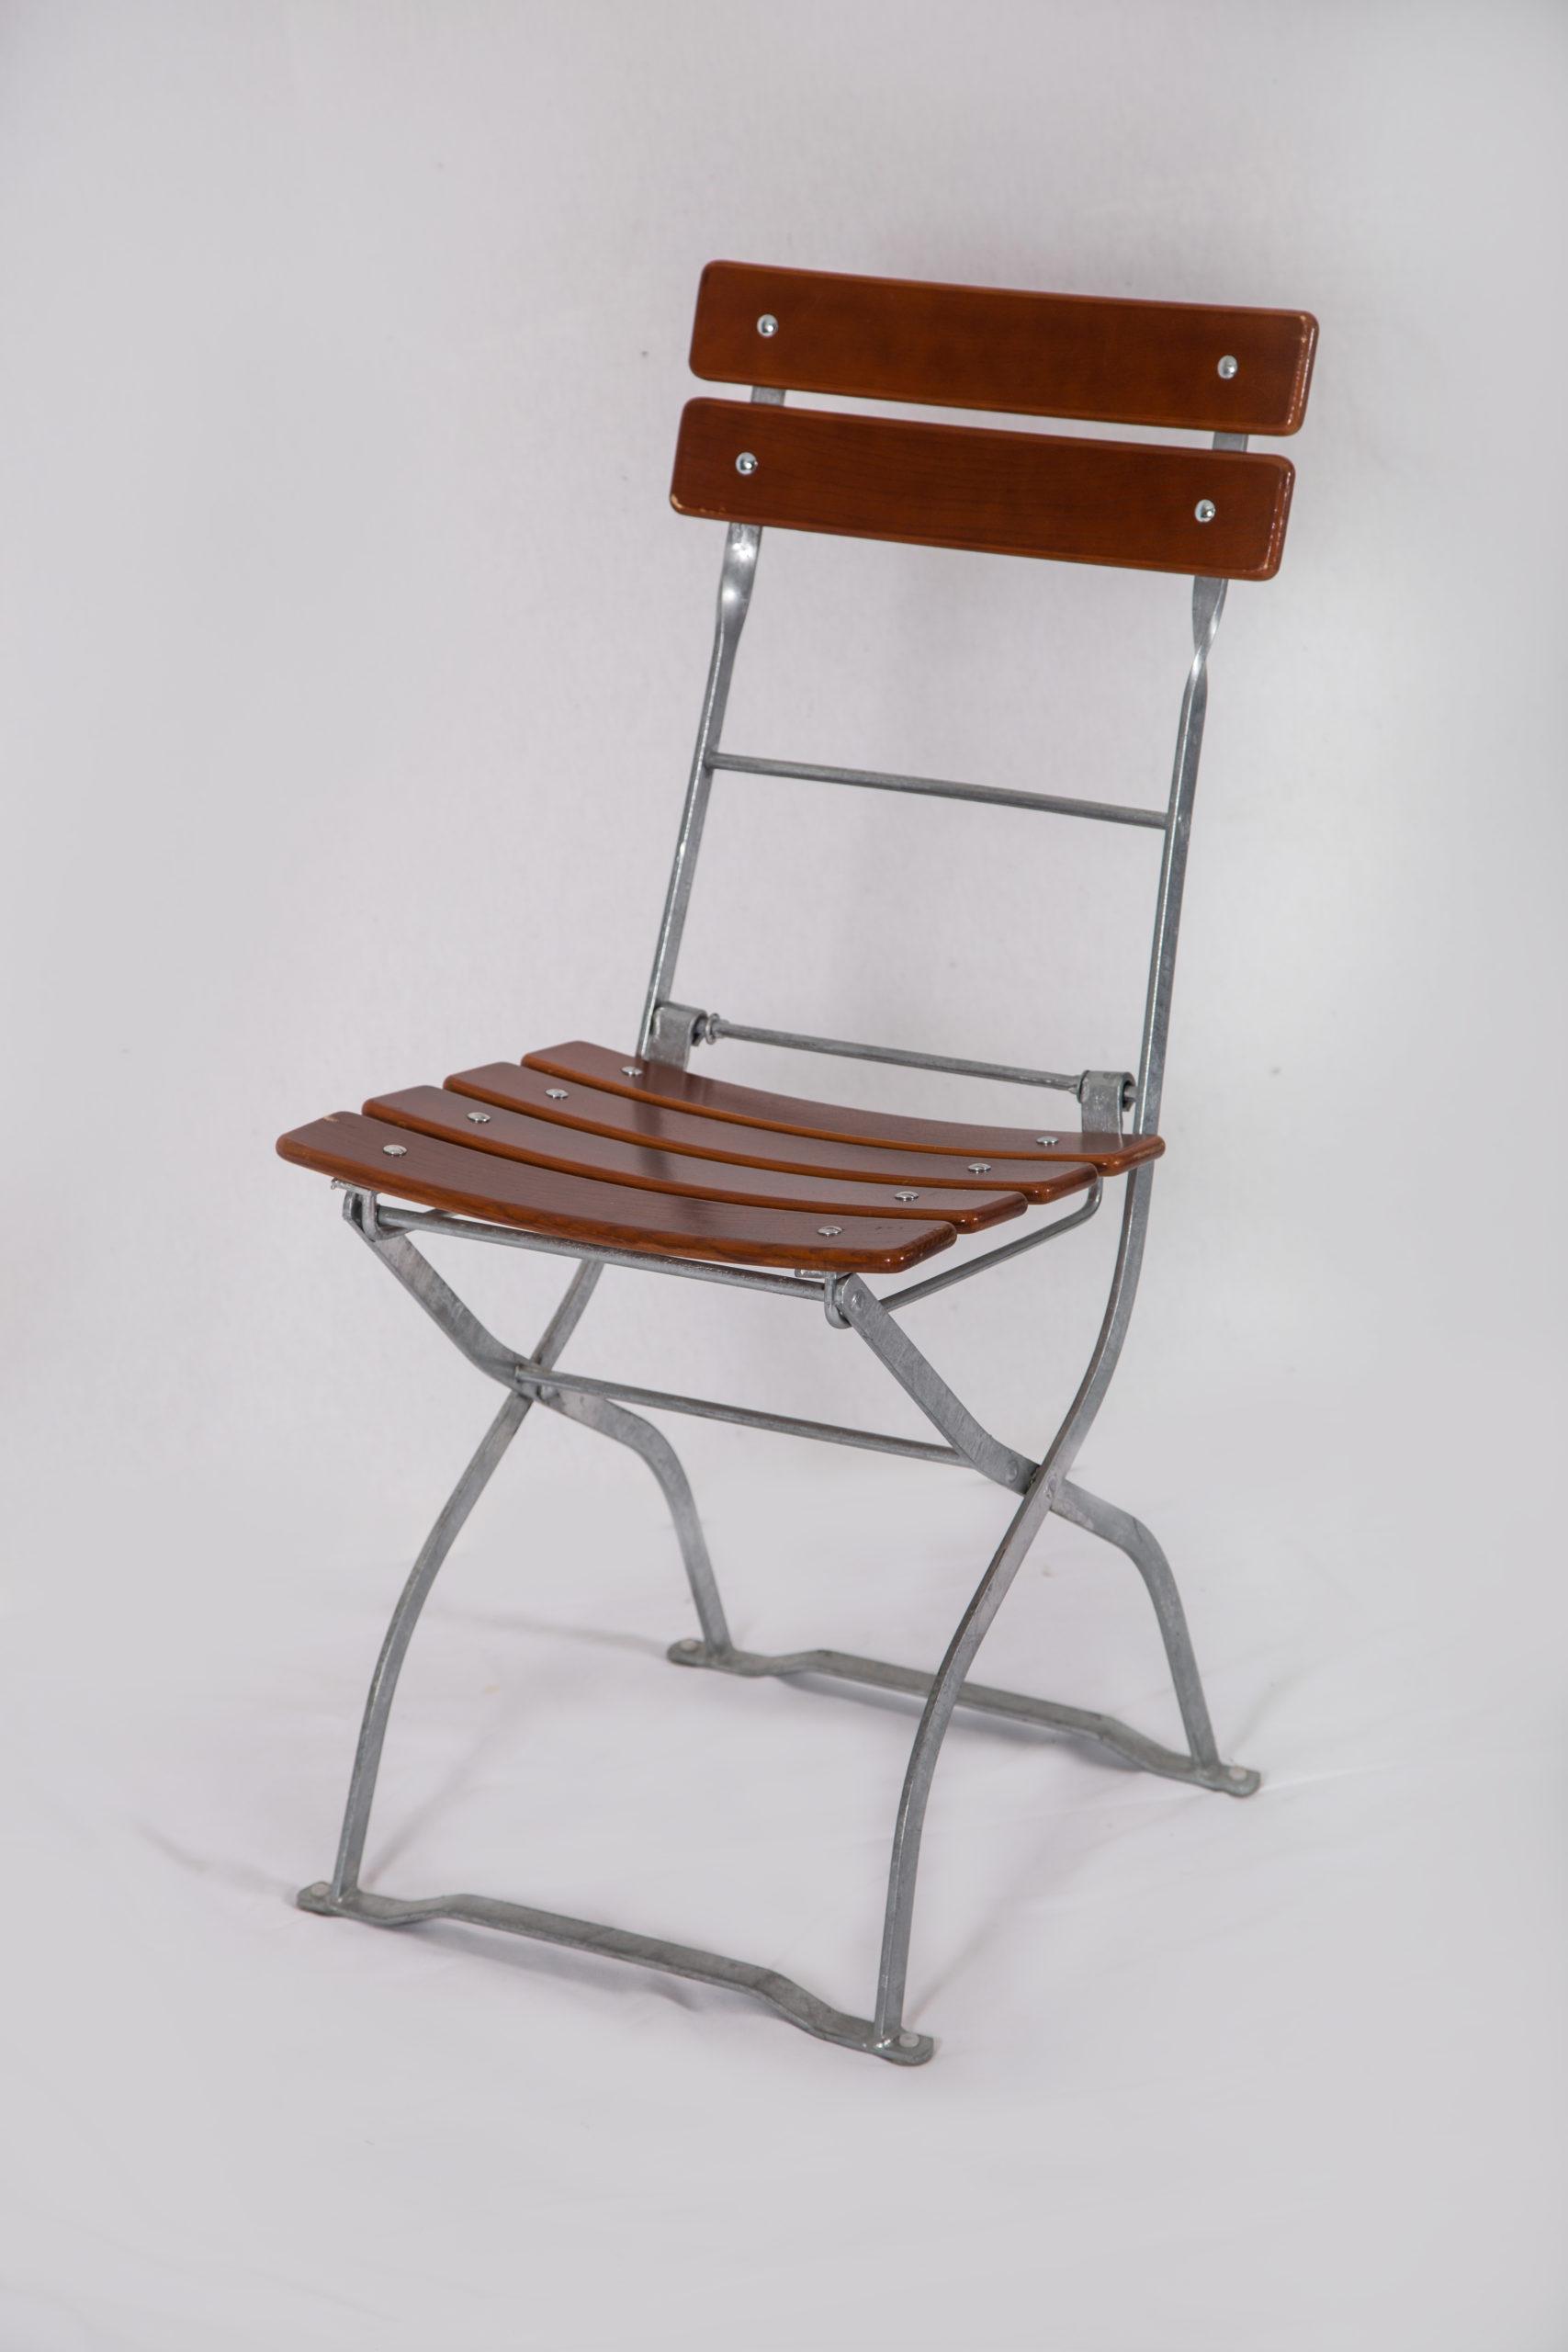 Gartenstuhl Stuhl rustikal einfach Holz